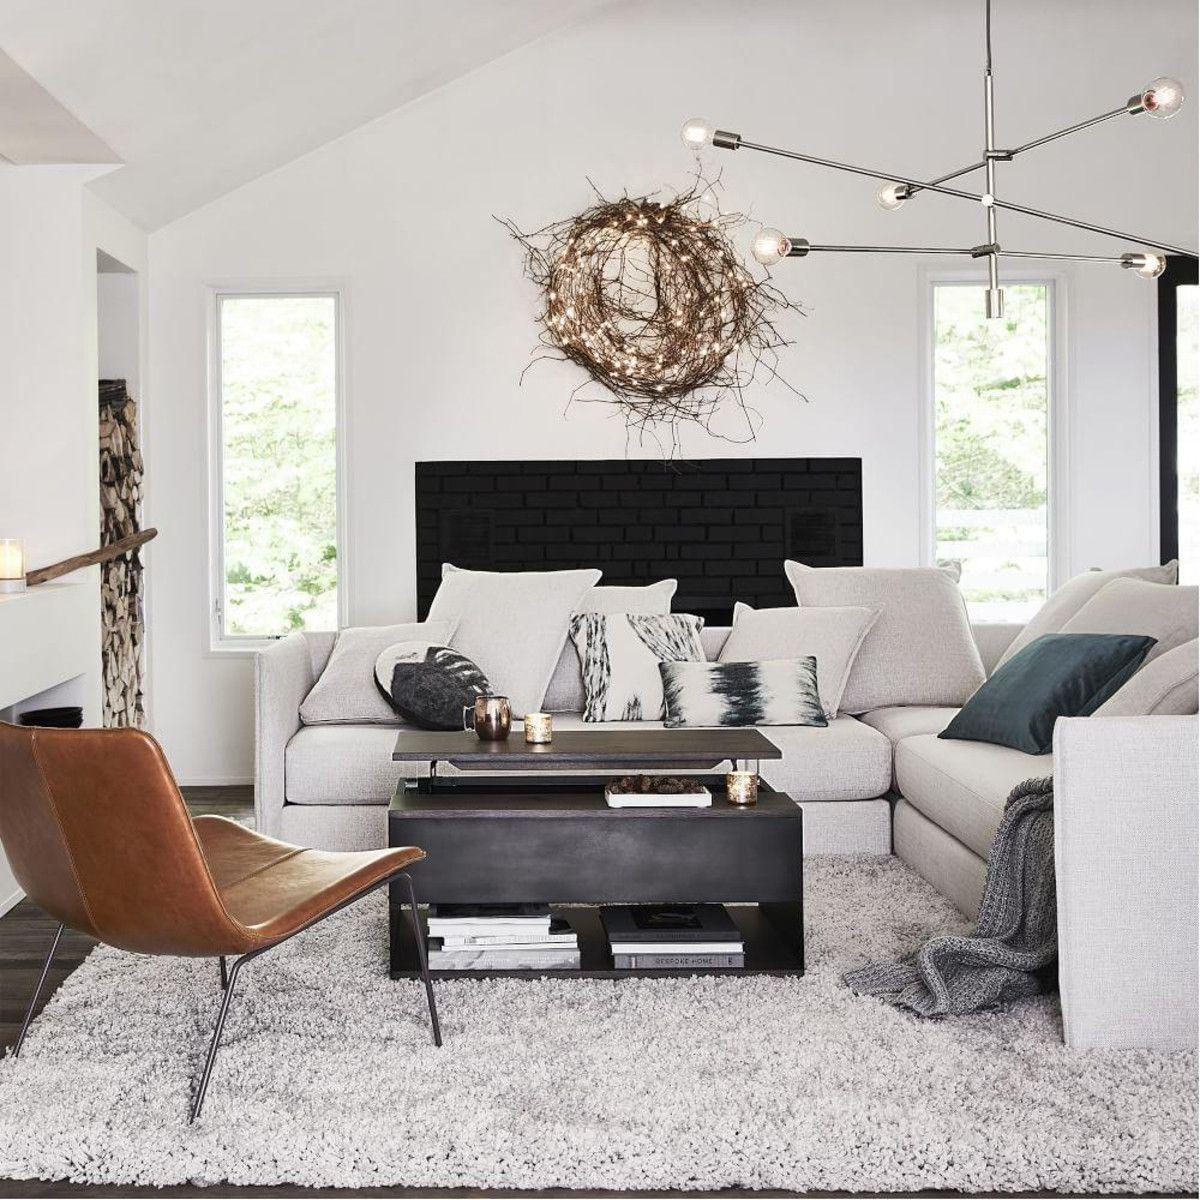 Cozy Plush Rug Frost Grey Home Decor Styles Interior Design Living Room Living Room Interior #plush #living #room #furniture